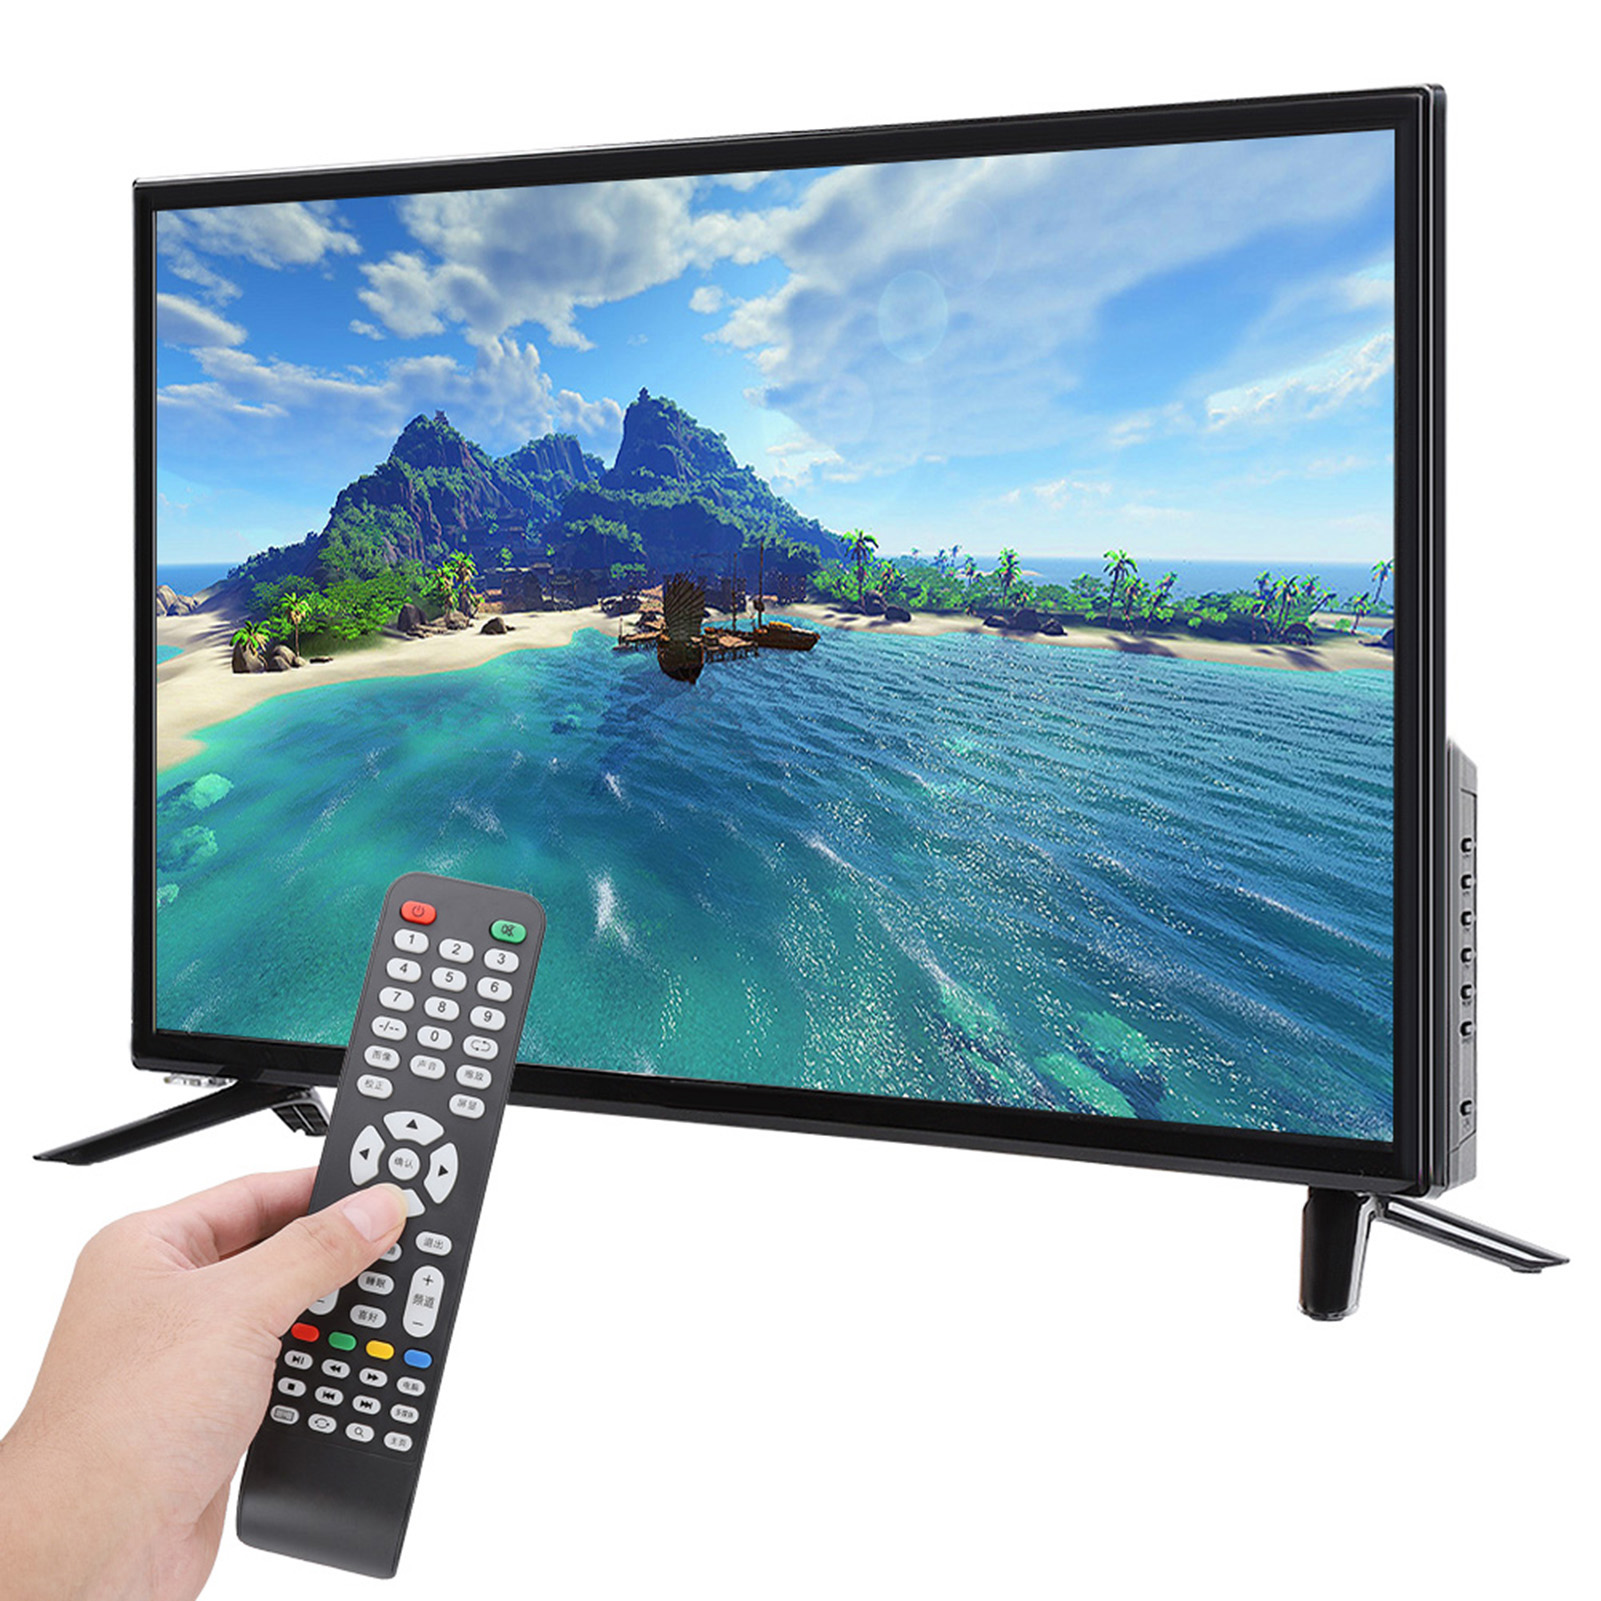 43inch-4K-WiFi-Network-HD-Smart-LCD-TV-HDR-Flat-Screen-Television-HDMI-USB-60HZ miniature 42